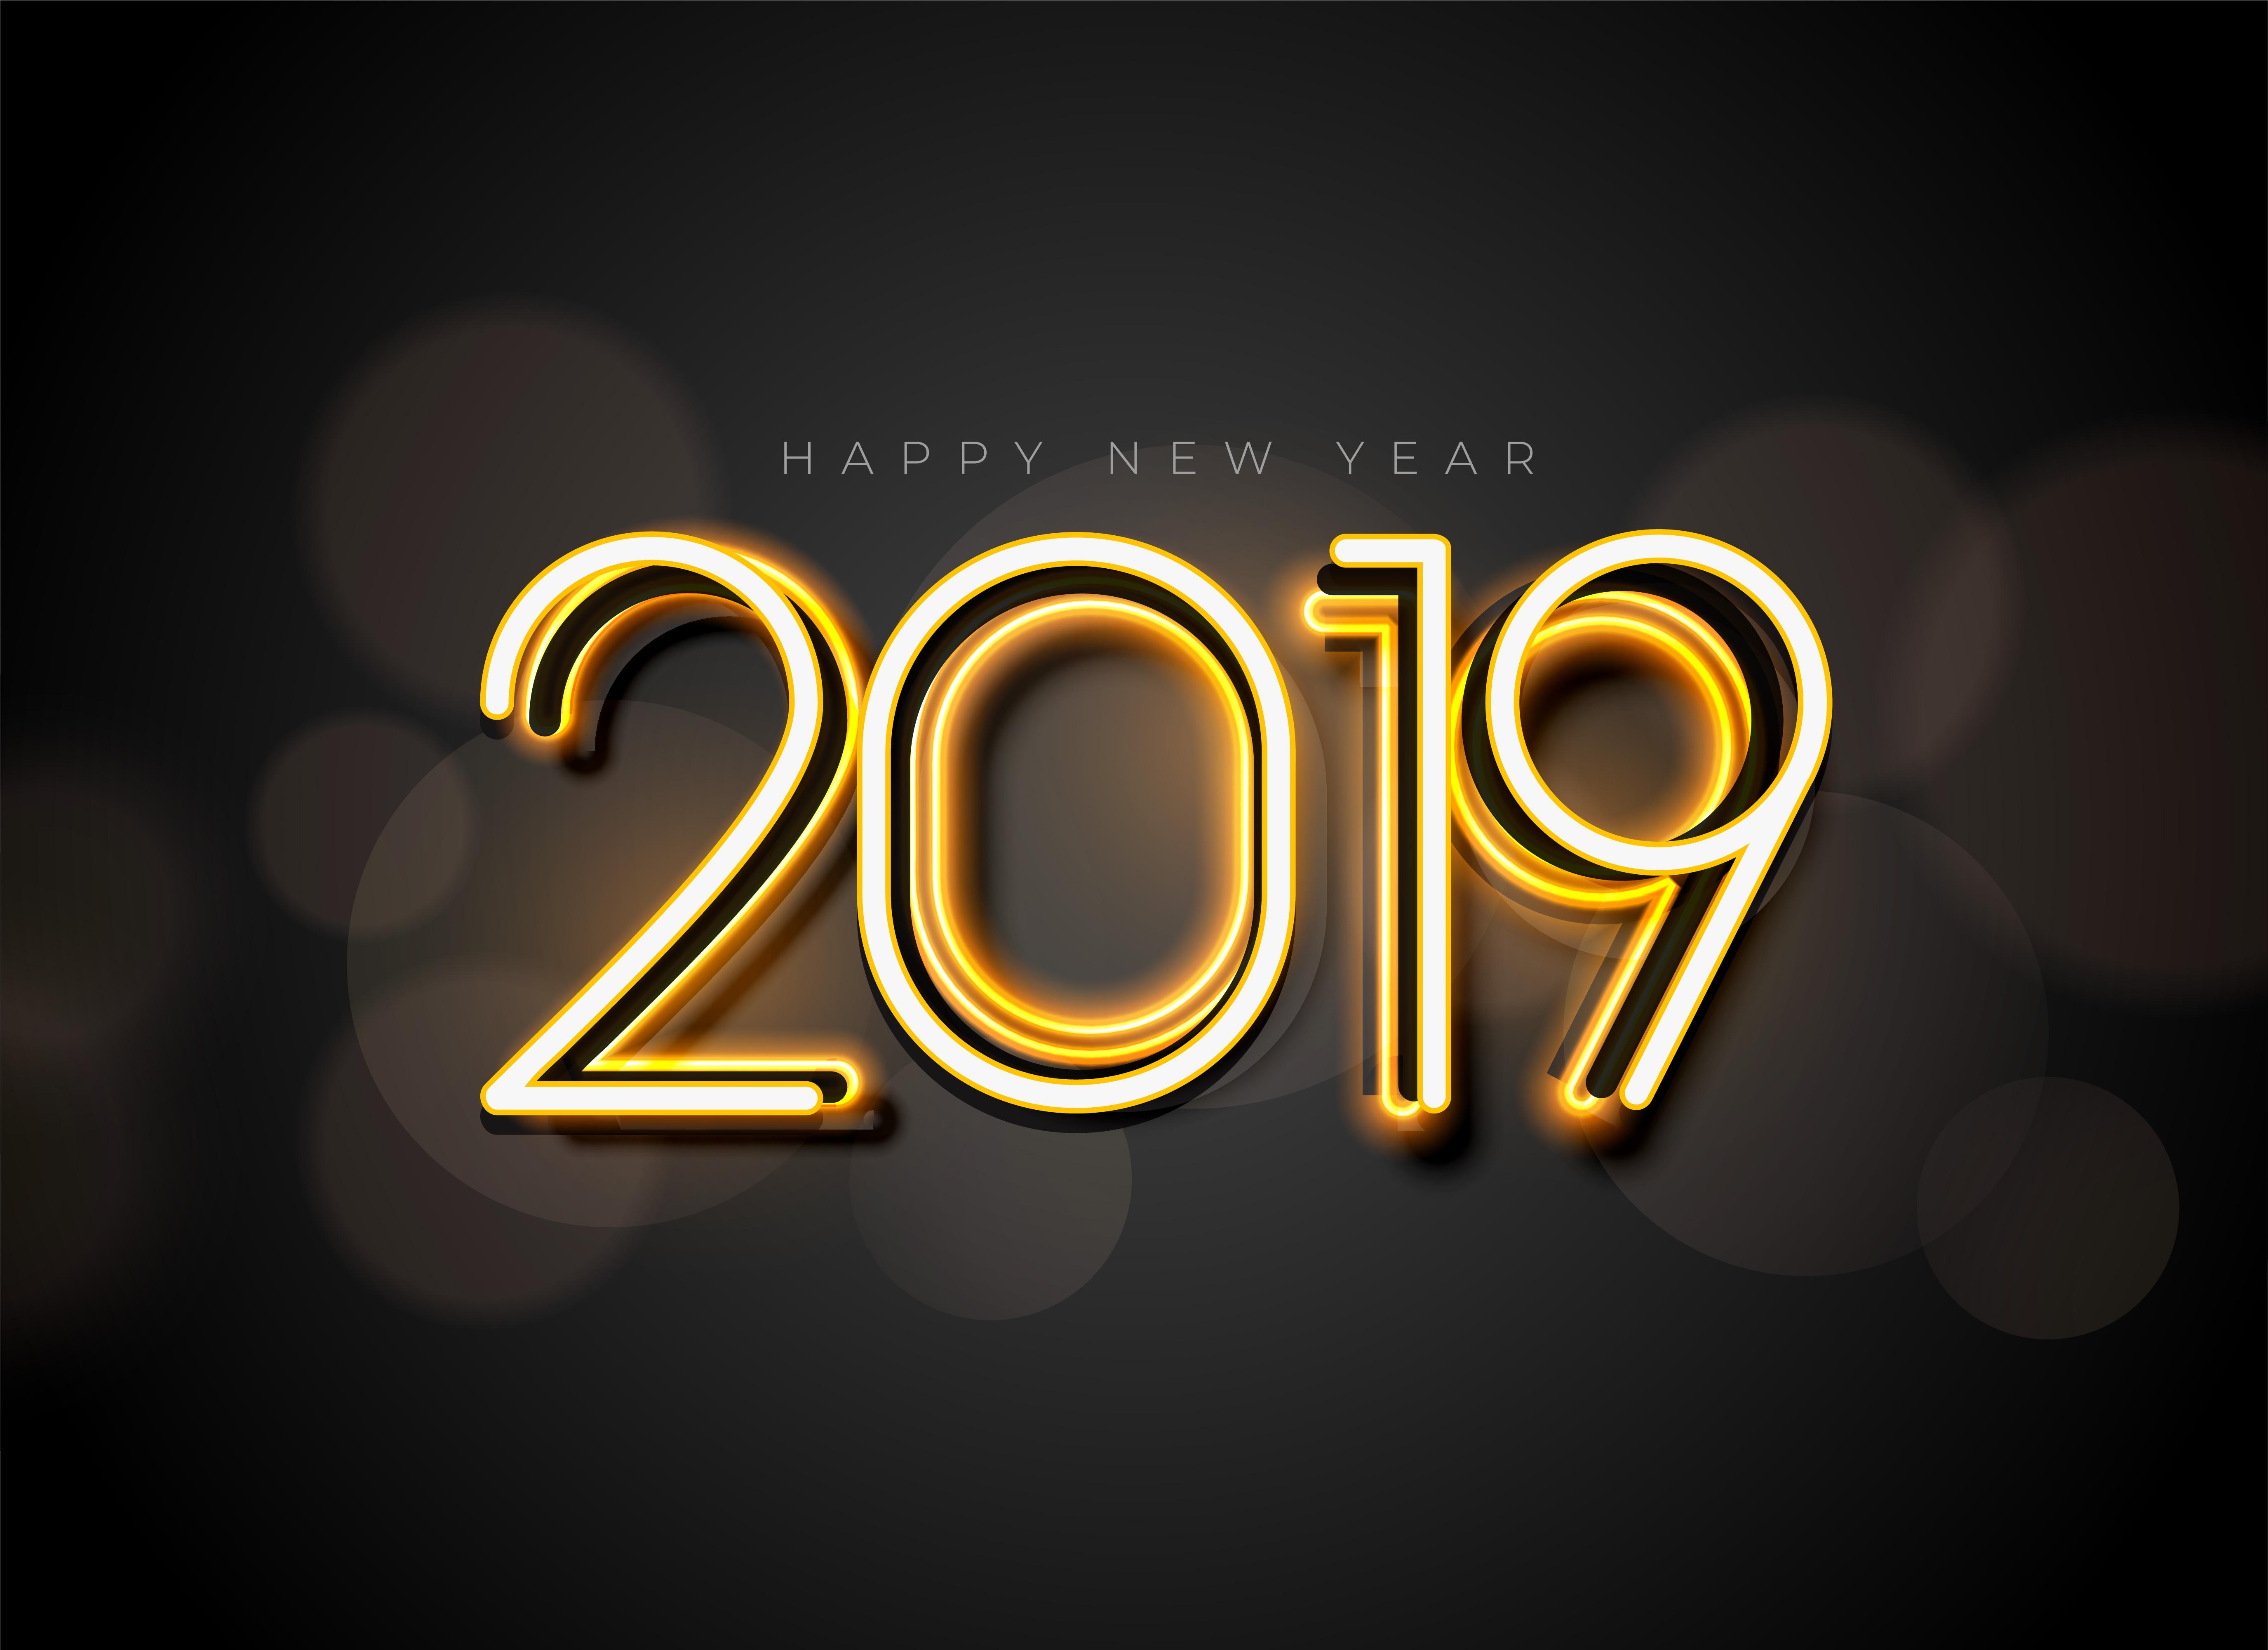 新年快乐创意2019时尚字体矢量素材 Happy New Year 2019 Stylish Text Design插图(3)